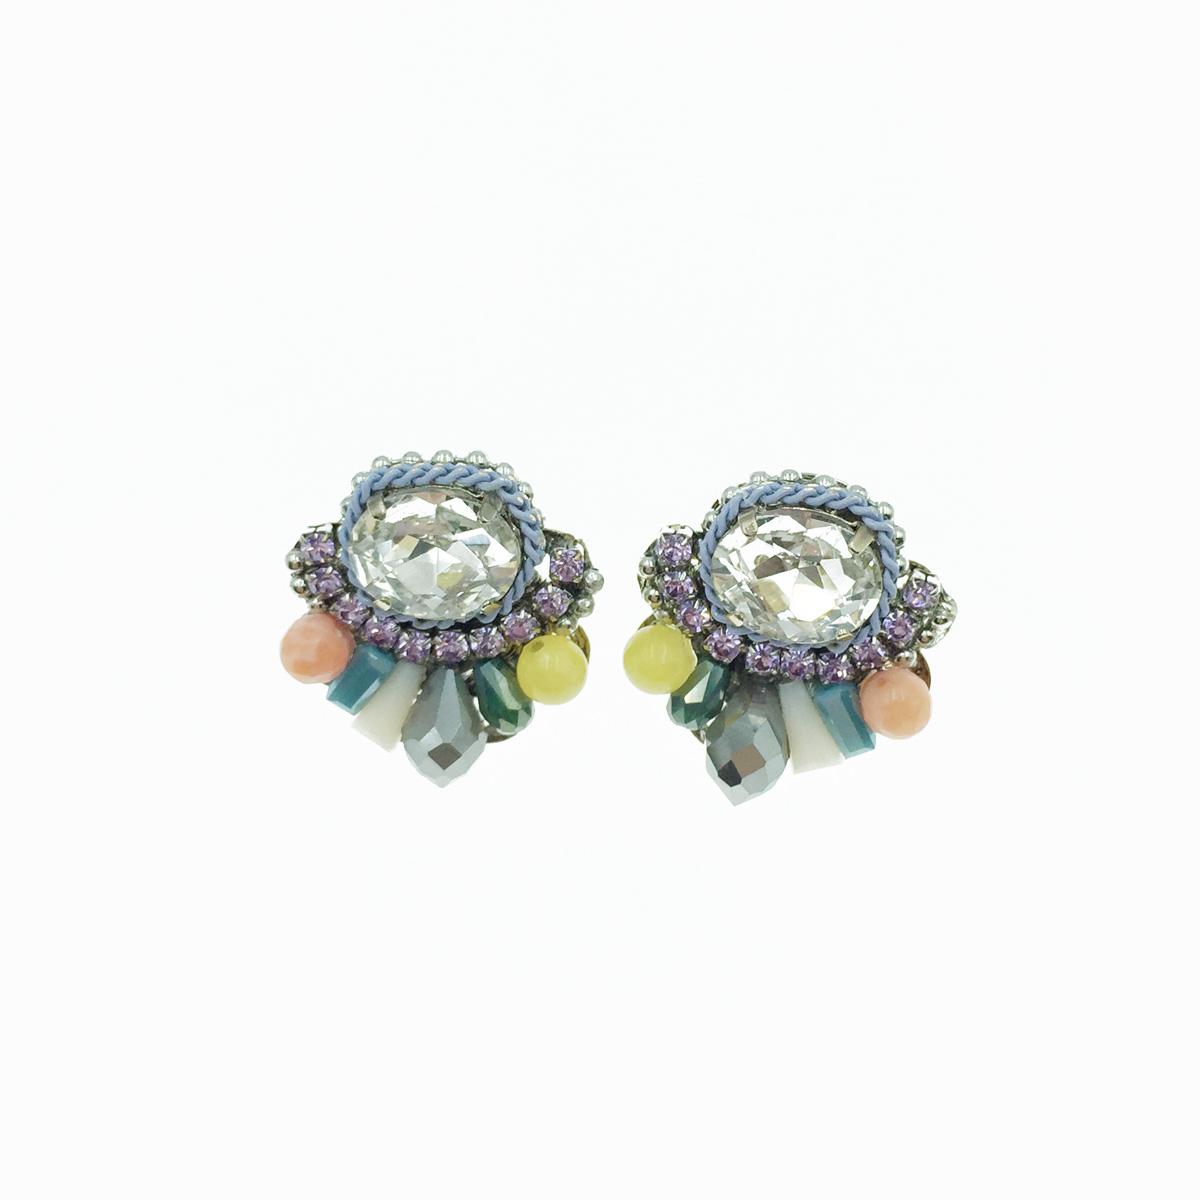 精緻水鑽 質感 耳針式耳環 採用施華洛世奇水晶元素 Crystals from Swarovski